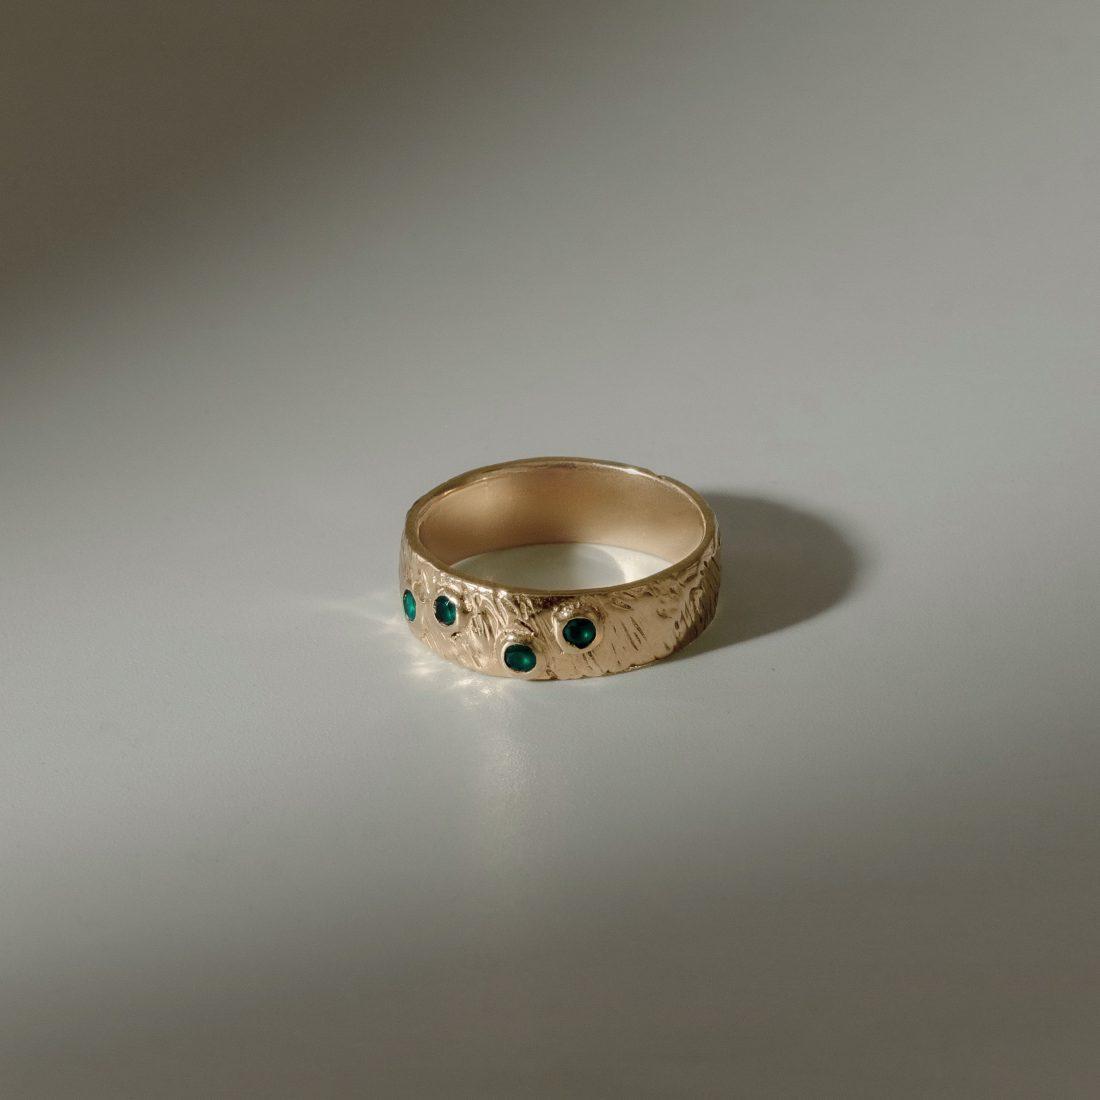 Кольцо «Кора» с четырмя камнями, позолота 2